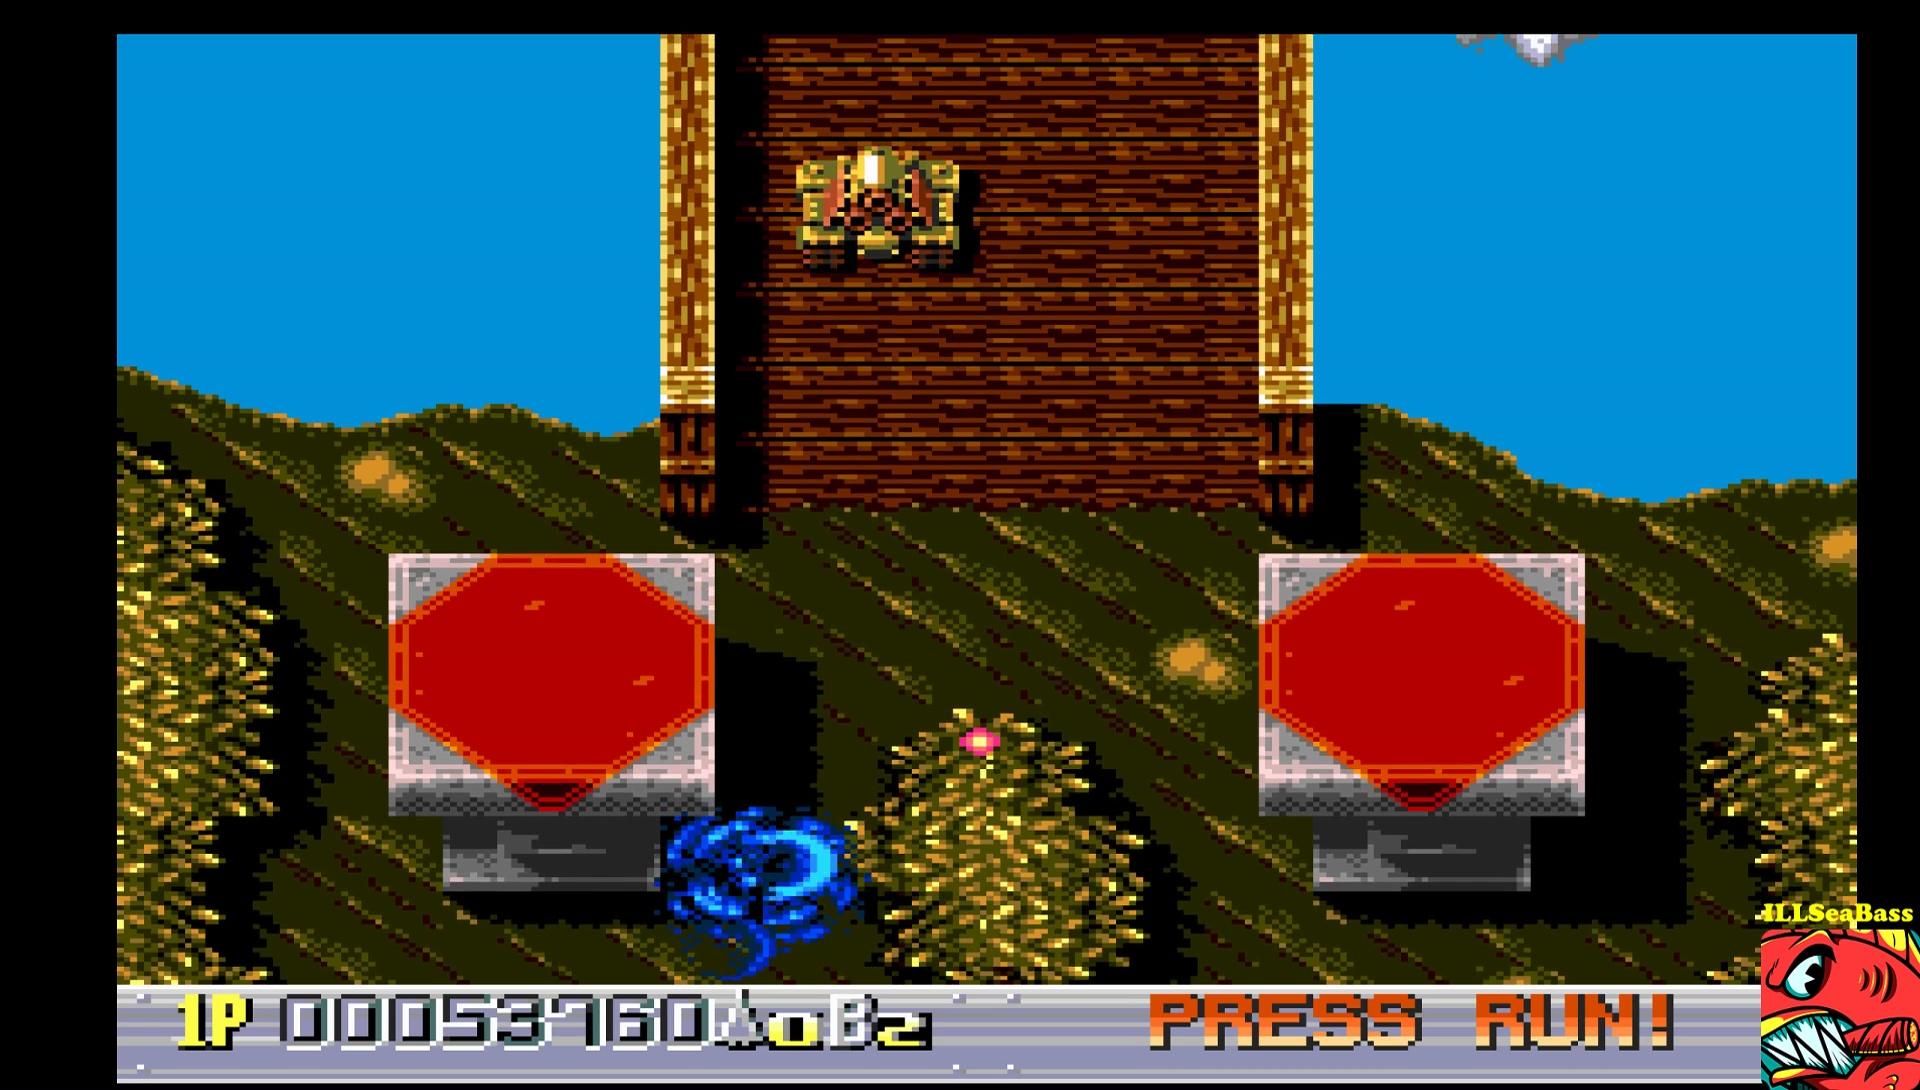 ILLSeaBass: Ginga Fukei Densetsu Sapphire (TurboGrafx-16/PC Engine Emulated) 53,760 points on 2017-02-01 18:50:42